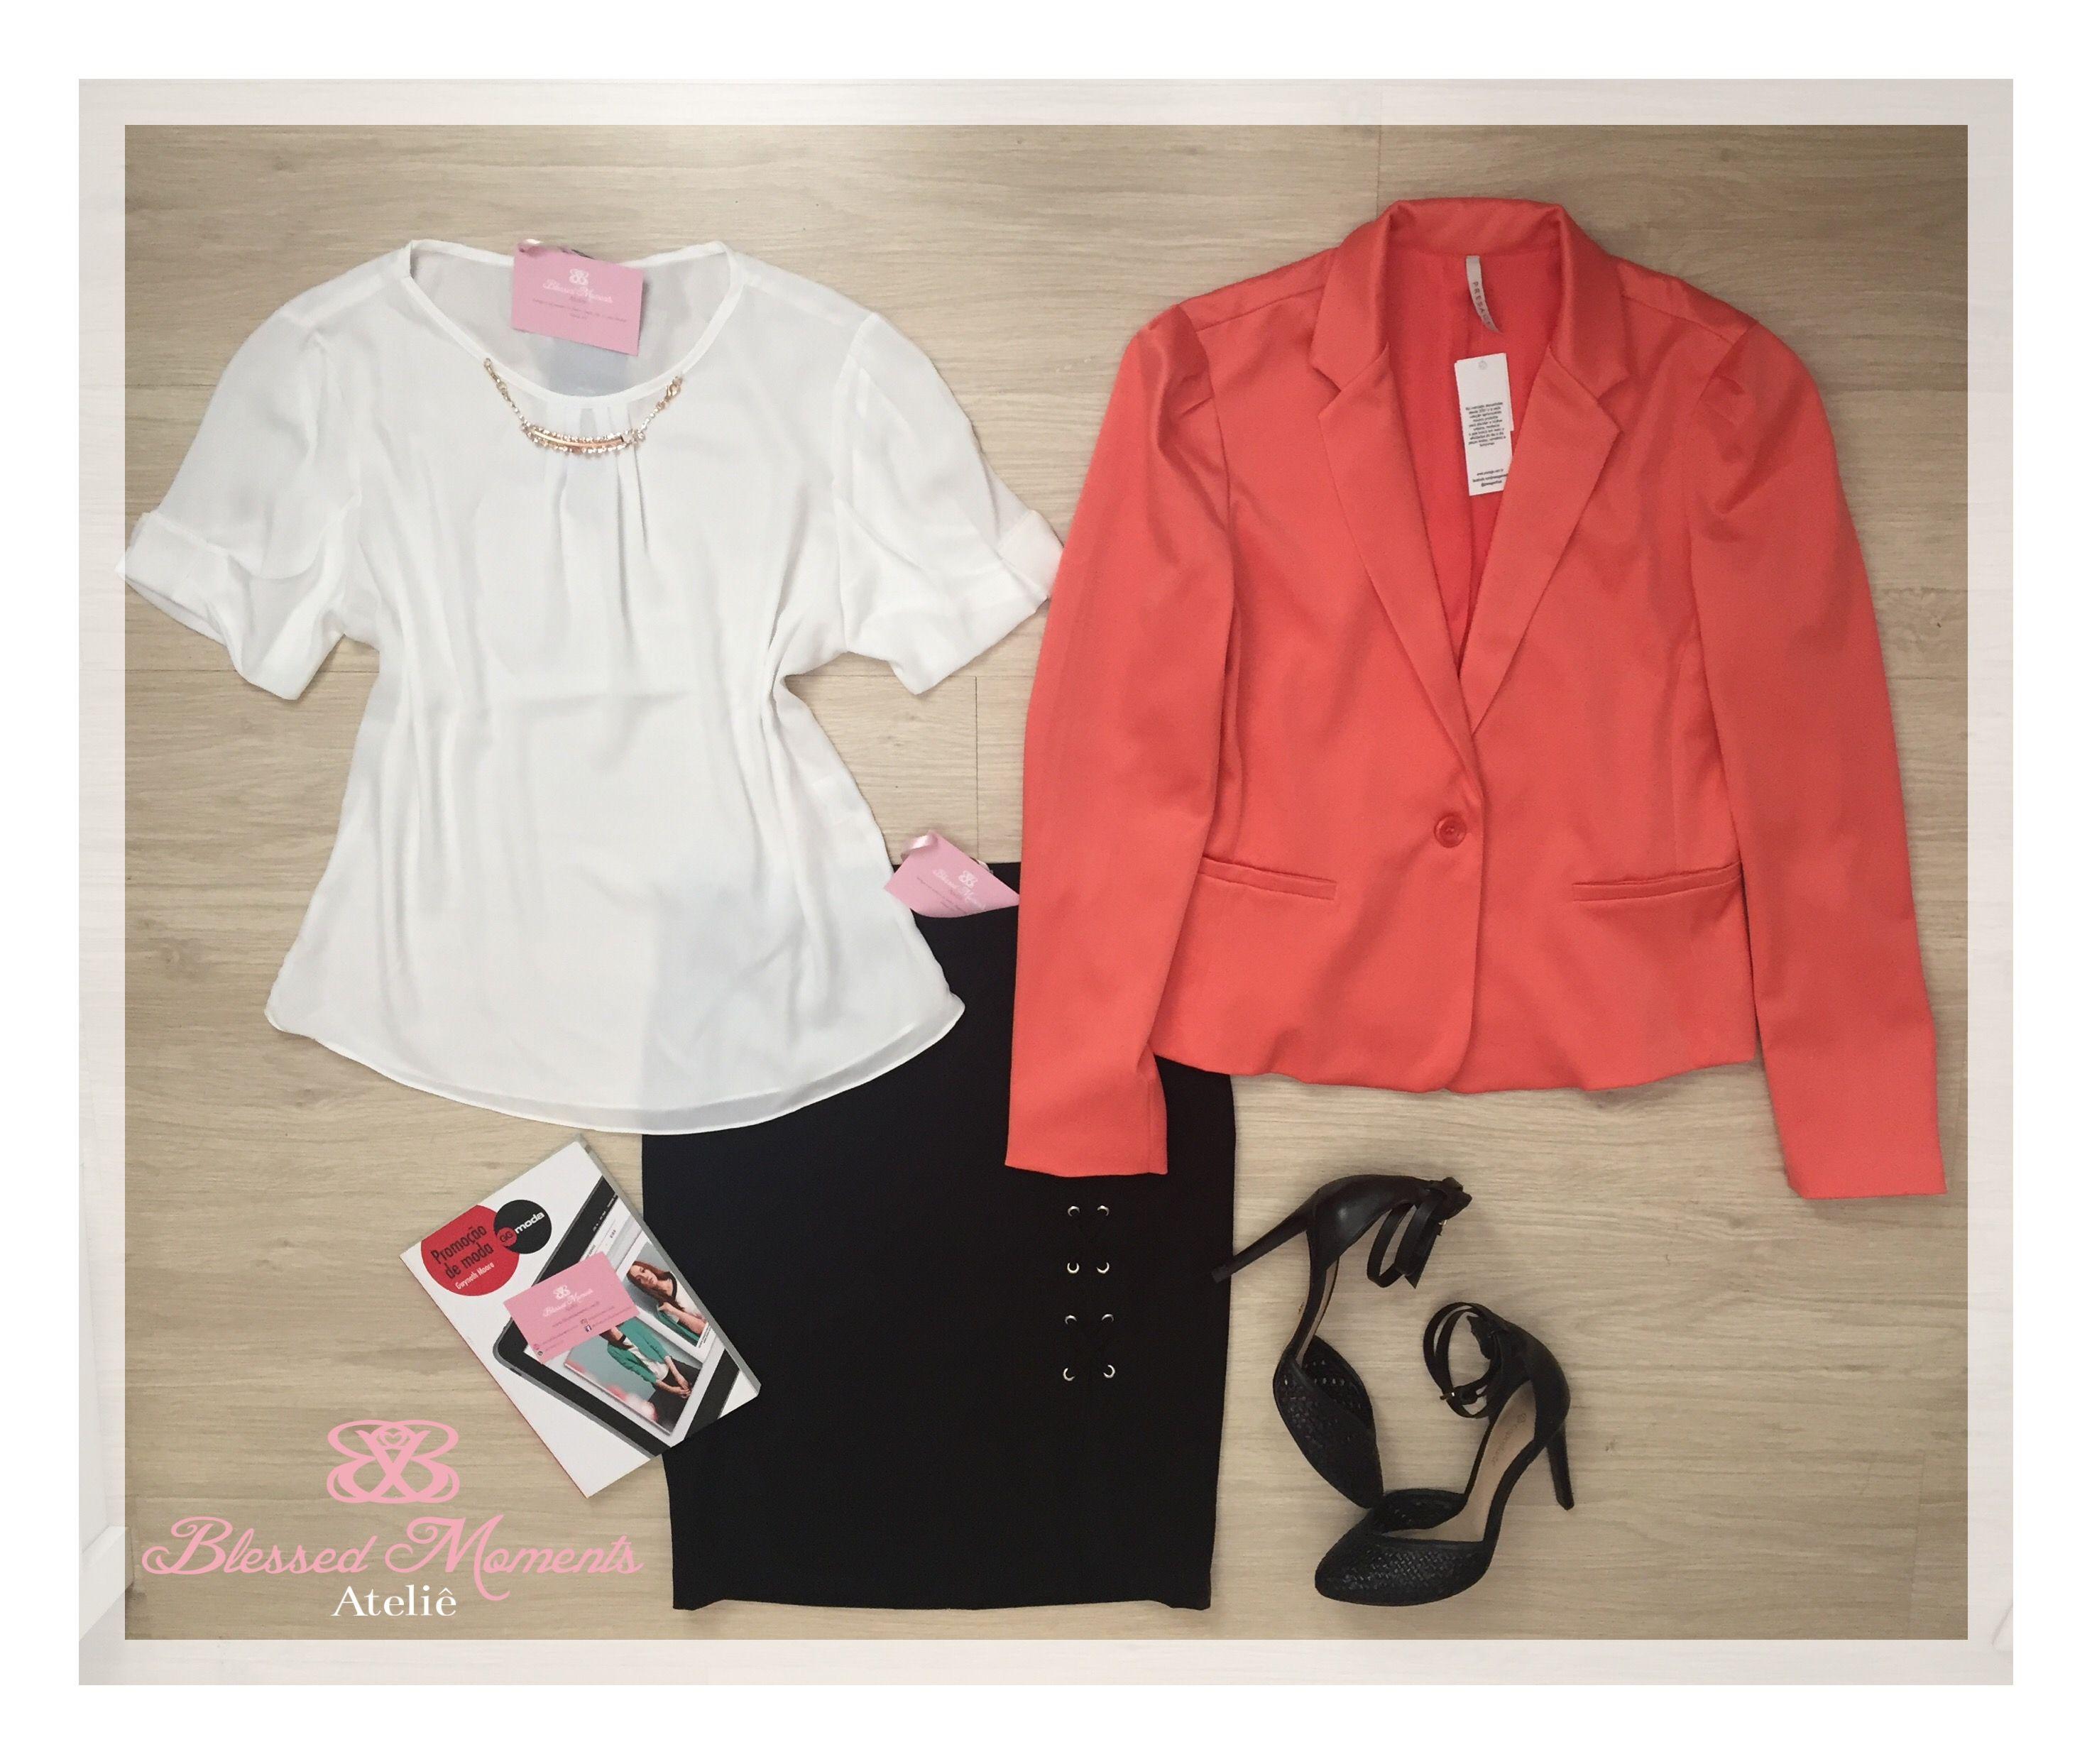 9eee6a12e4 Blusa crepe off white + Blazer Laranja + saia lápis Preta - look de trabalho  - moda executiva